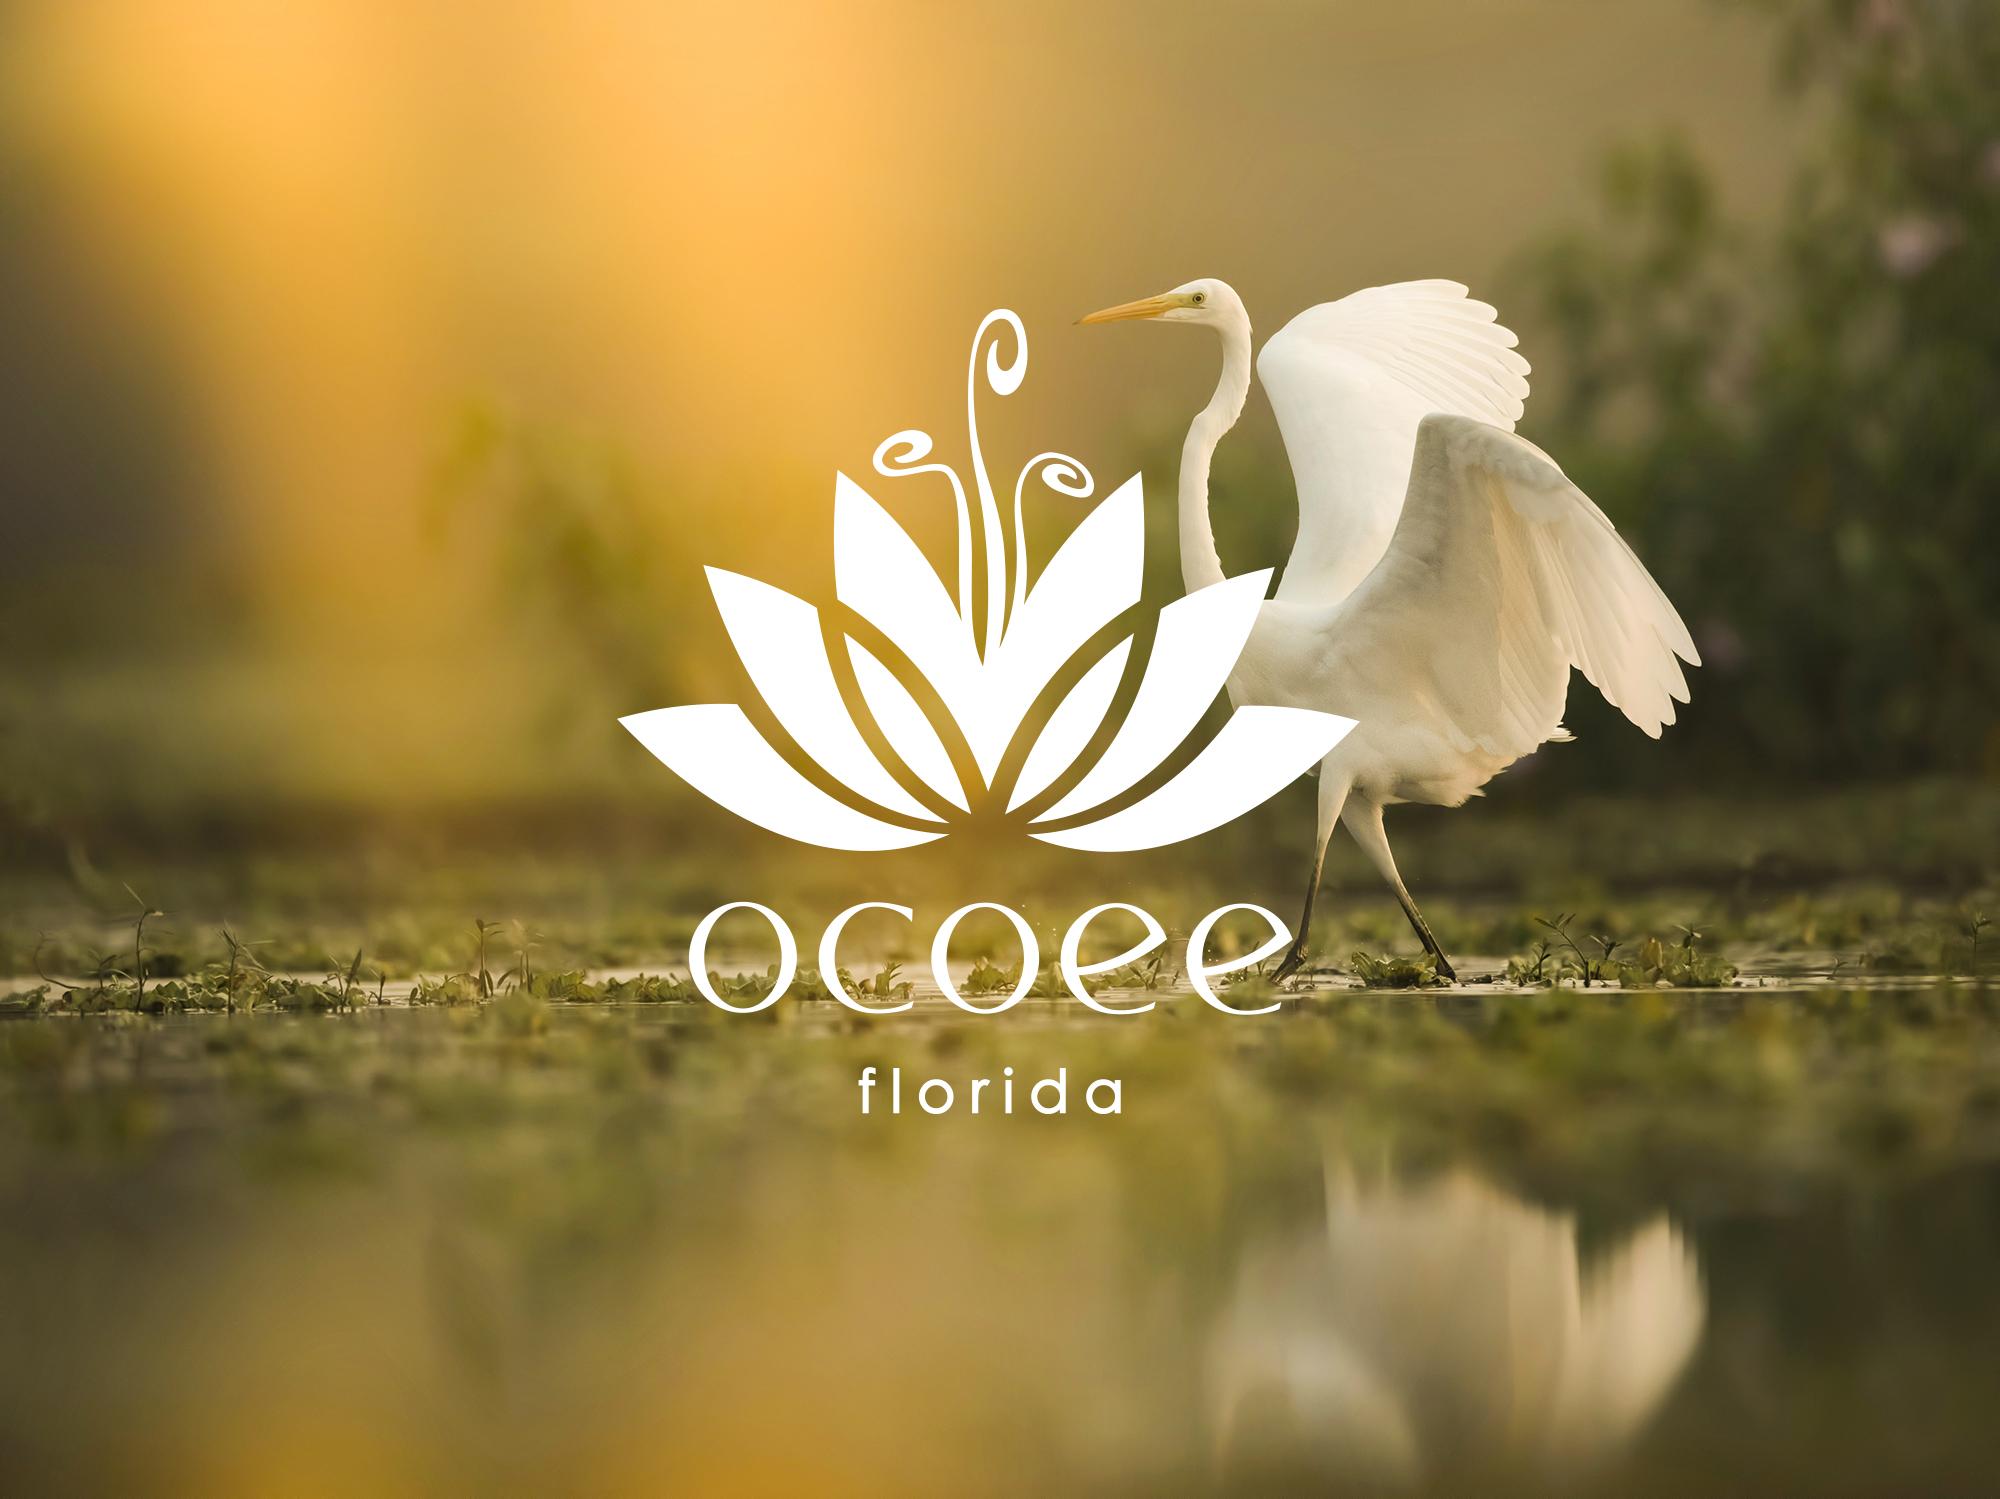 Designing for Ocoee